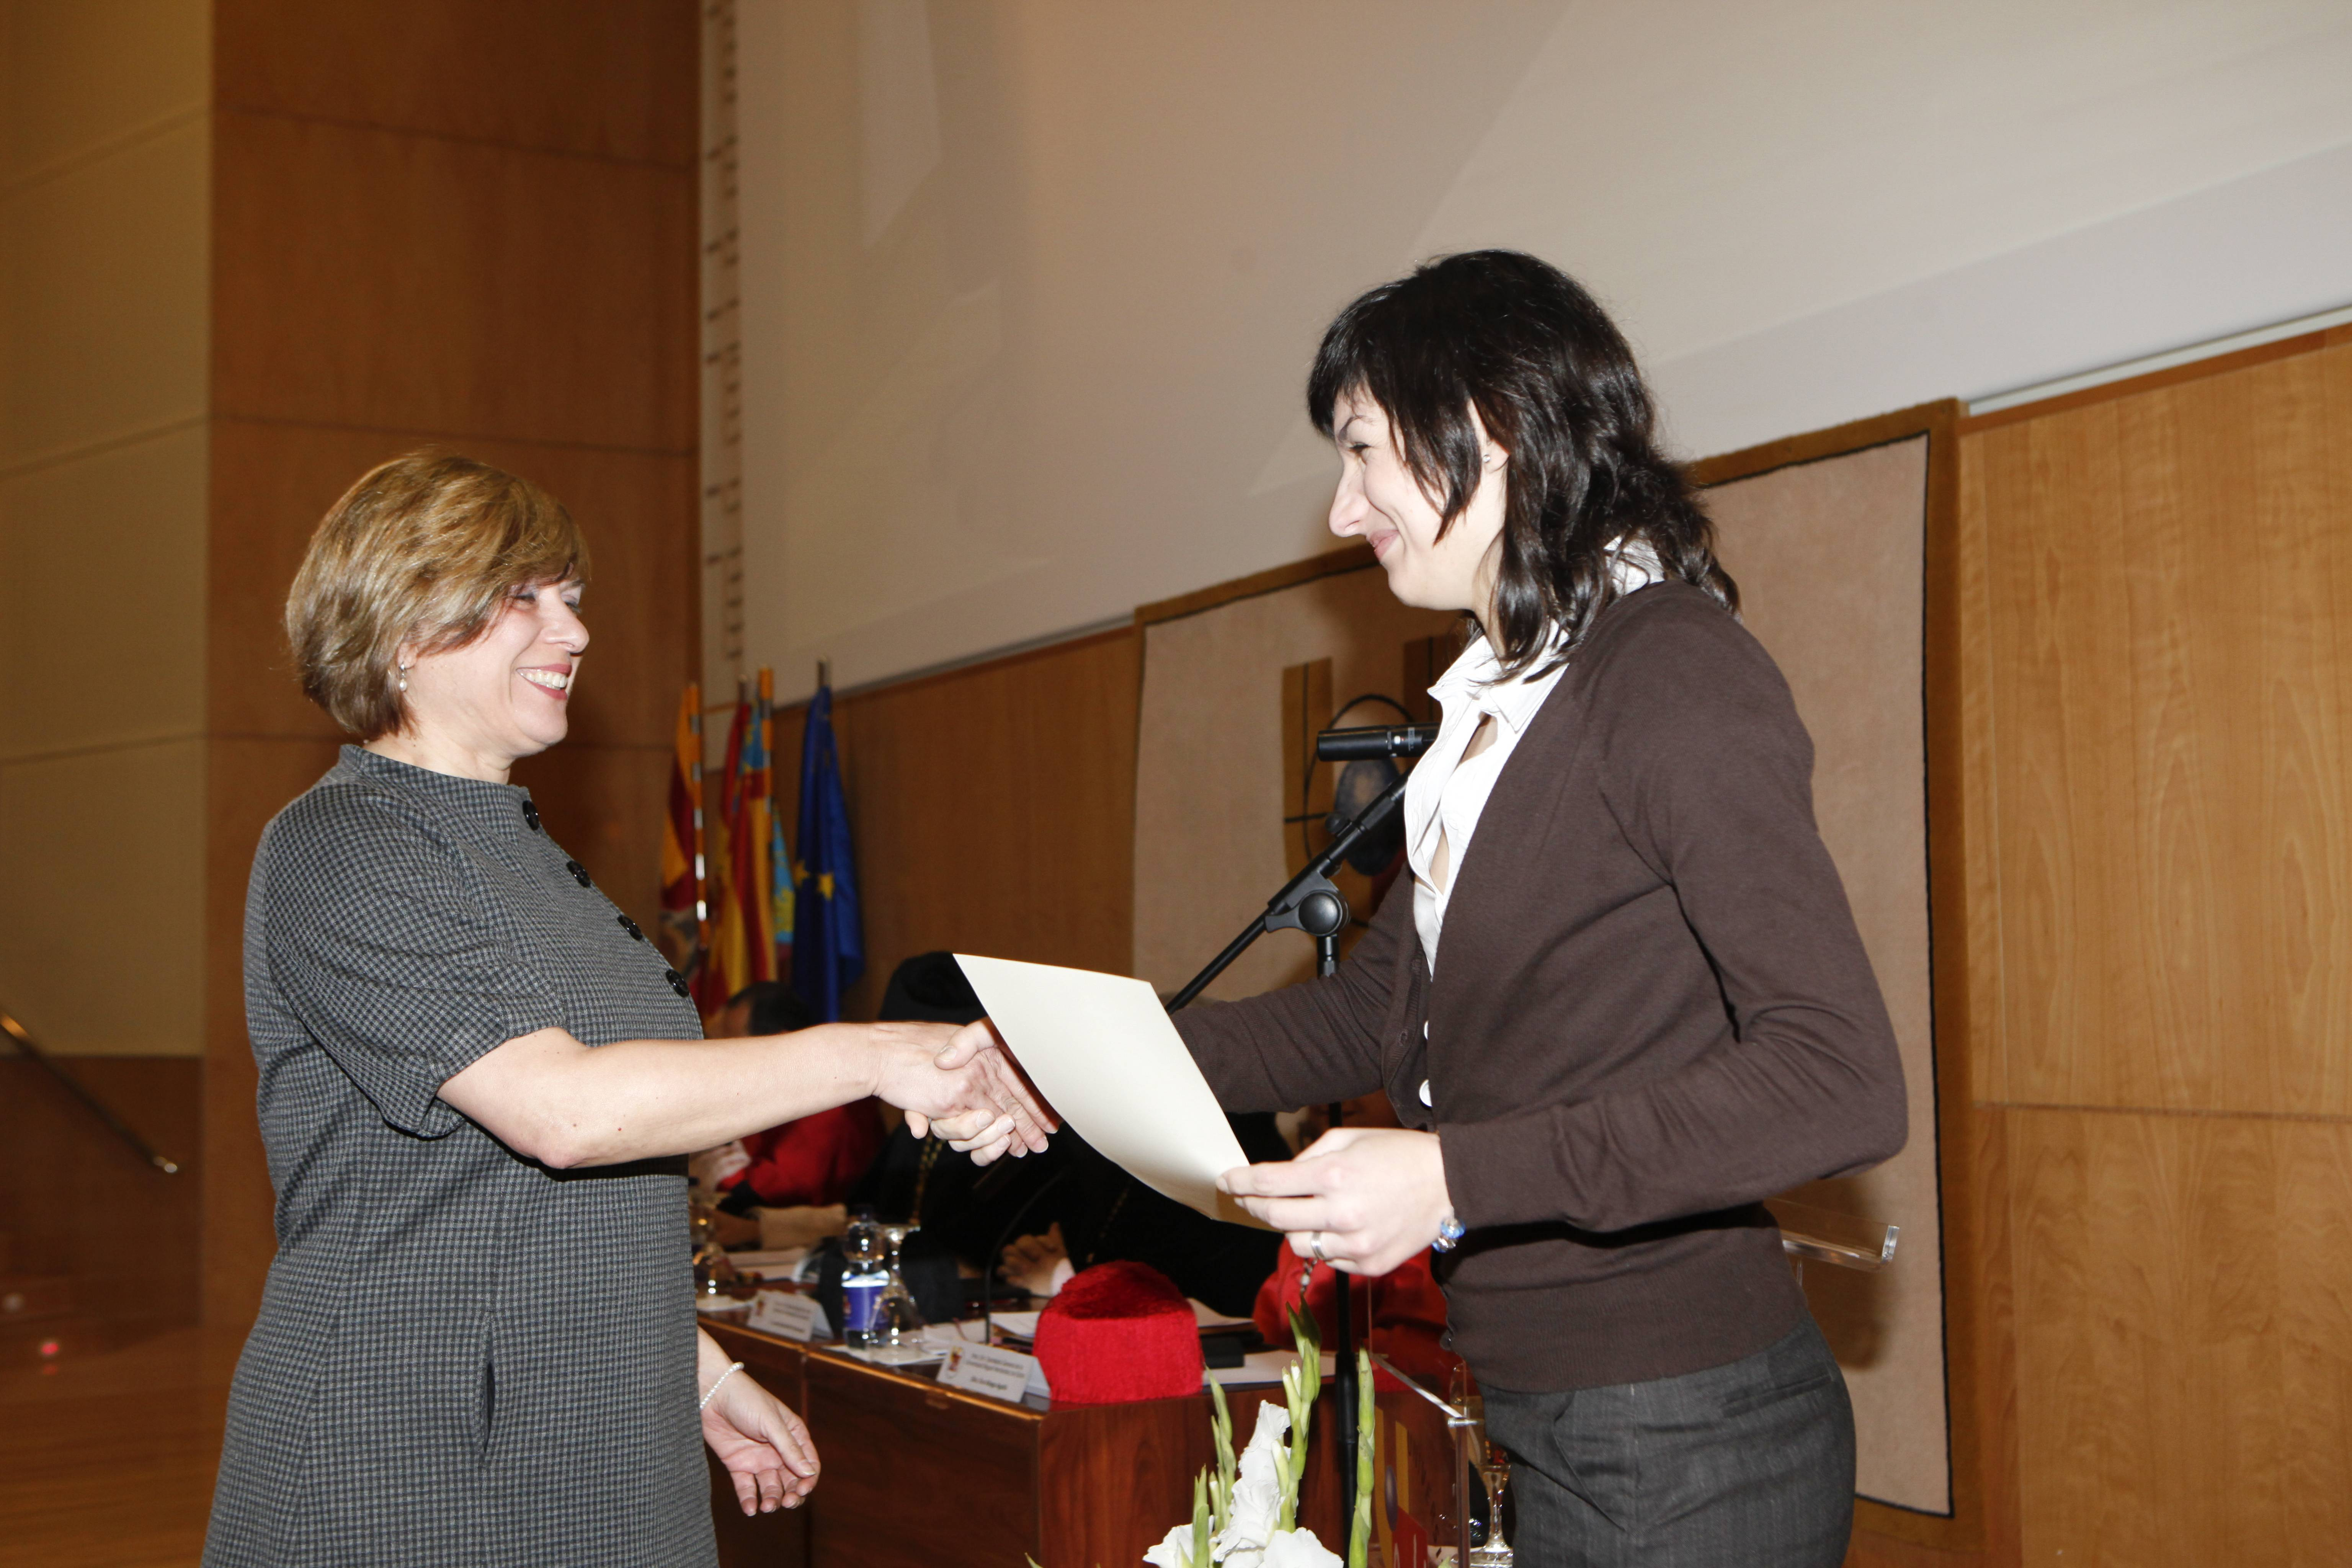 doctor-honoris-causa-luis-gamir_mg_1004.jpg